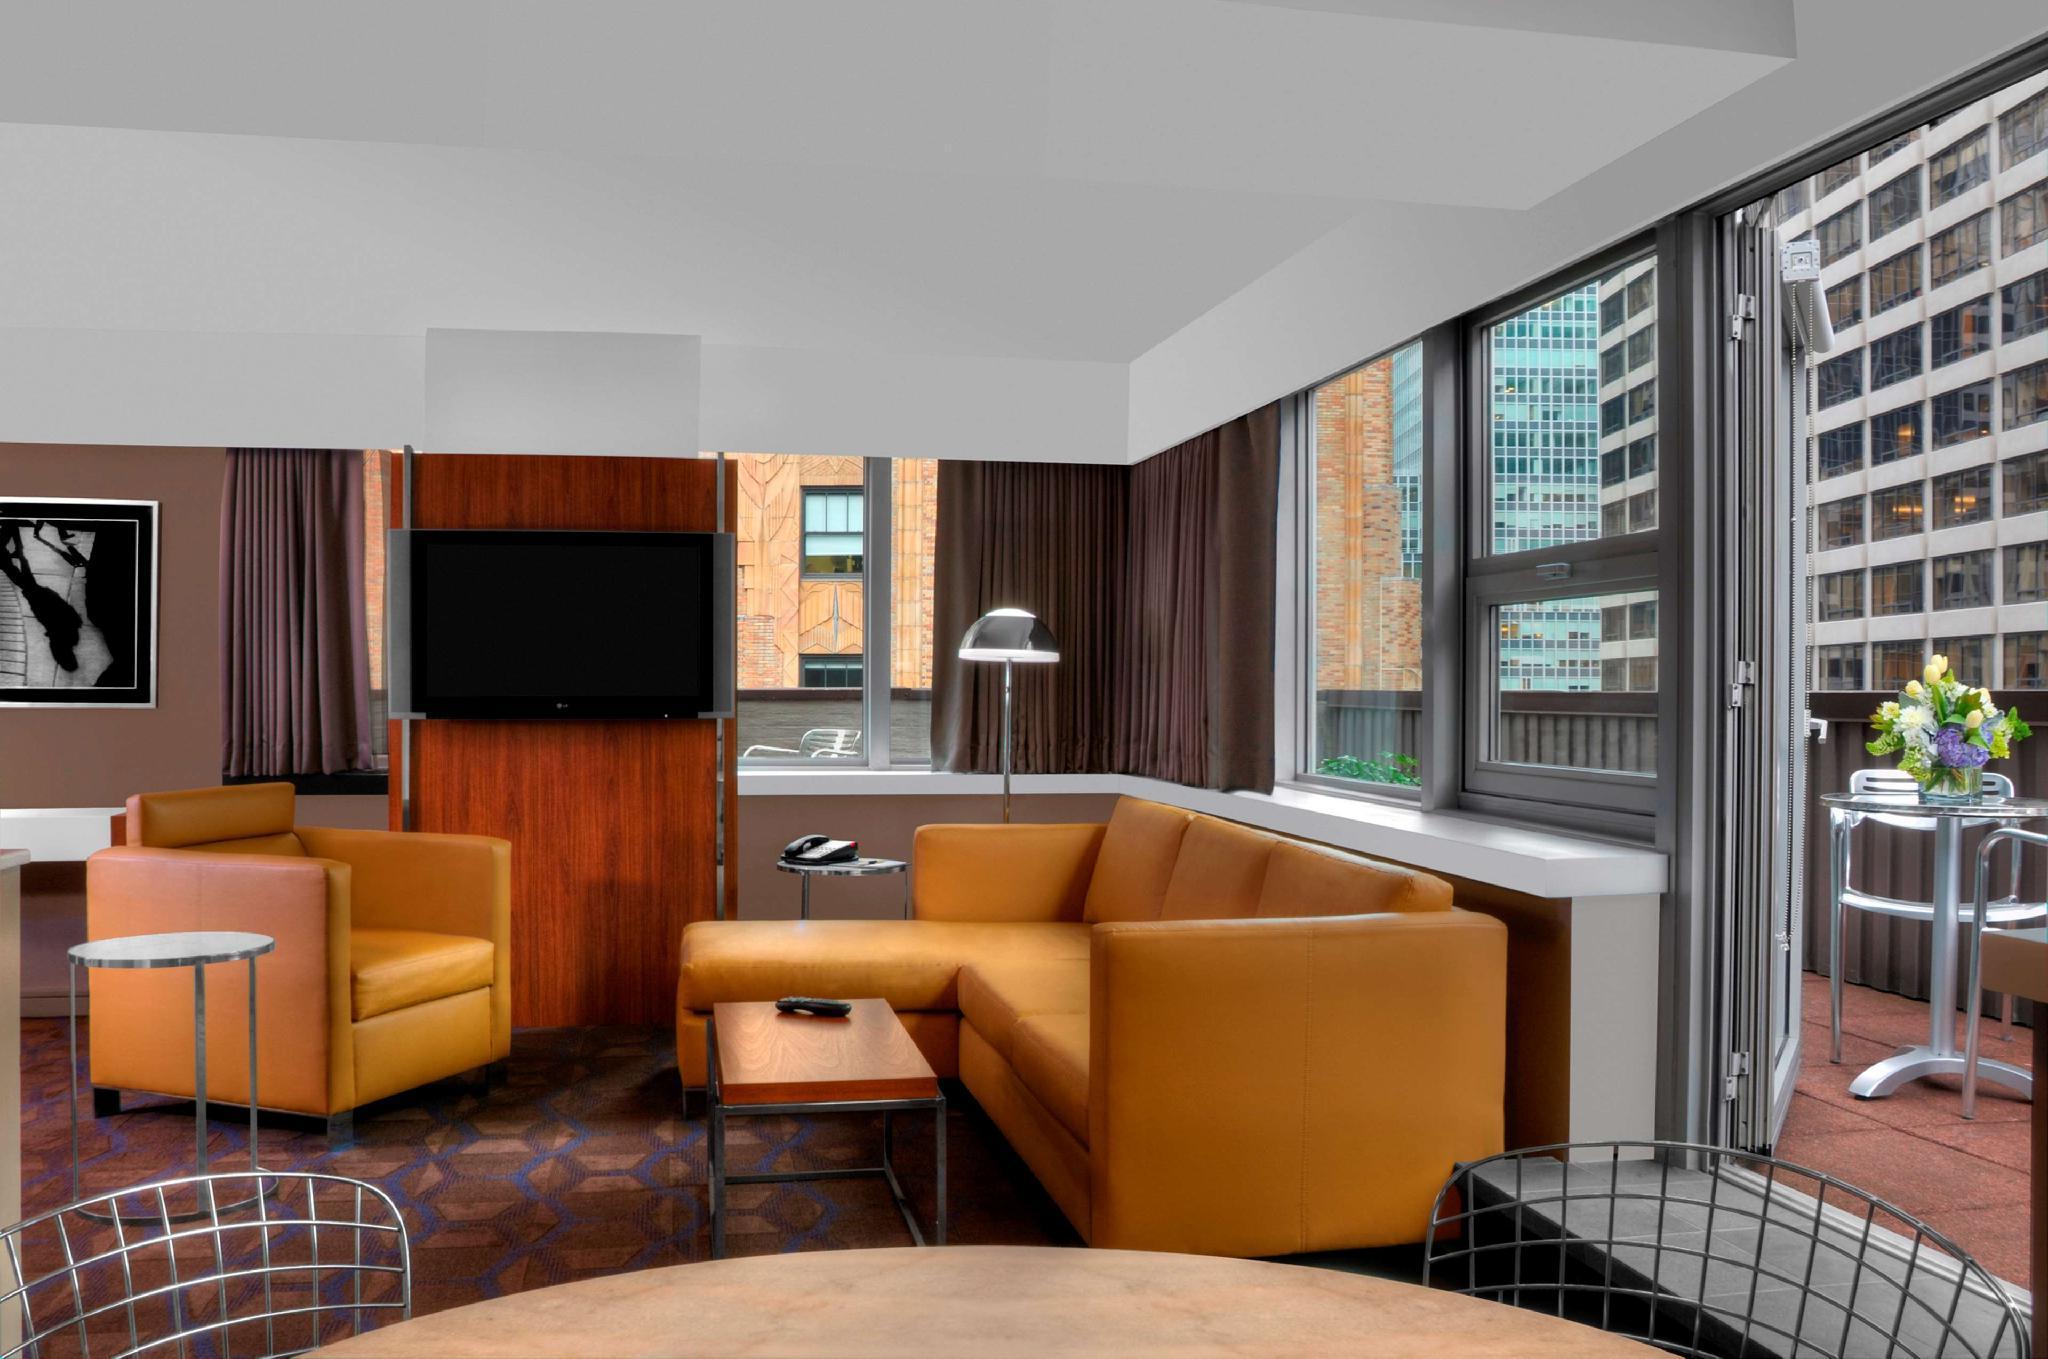 Doubletree By Hilton Metropolitan New York City Hotel New York Ny Deals Photos Reviews